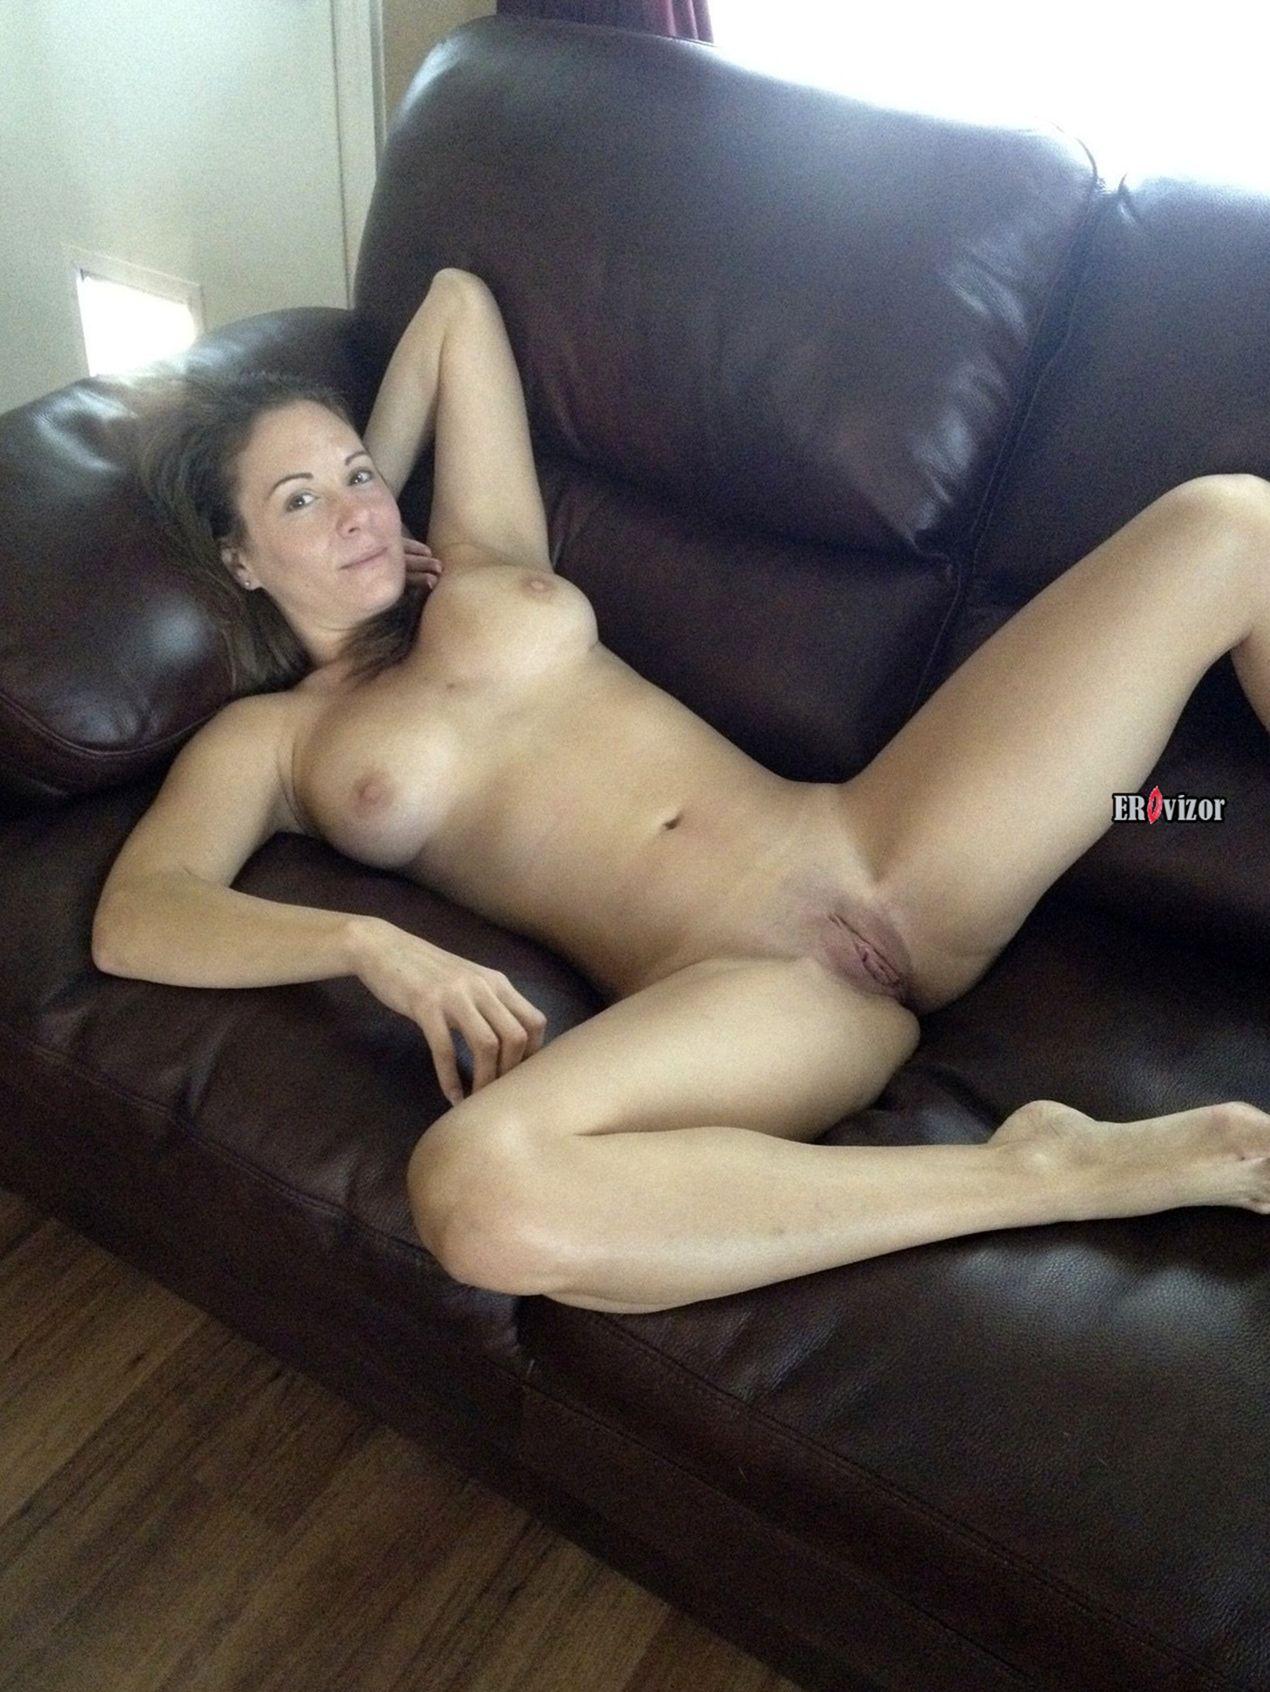 Голая жена на кожанном диване